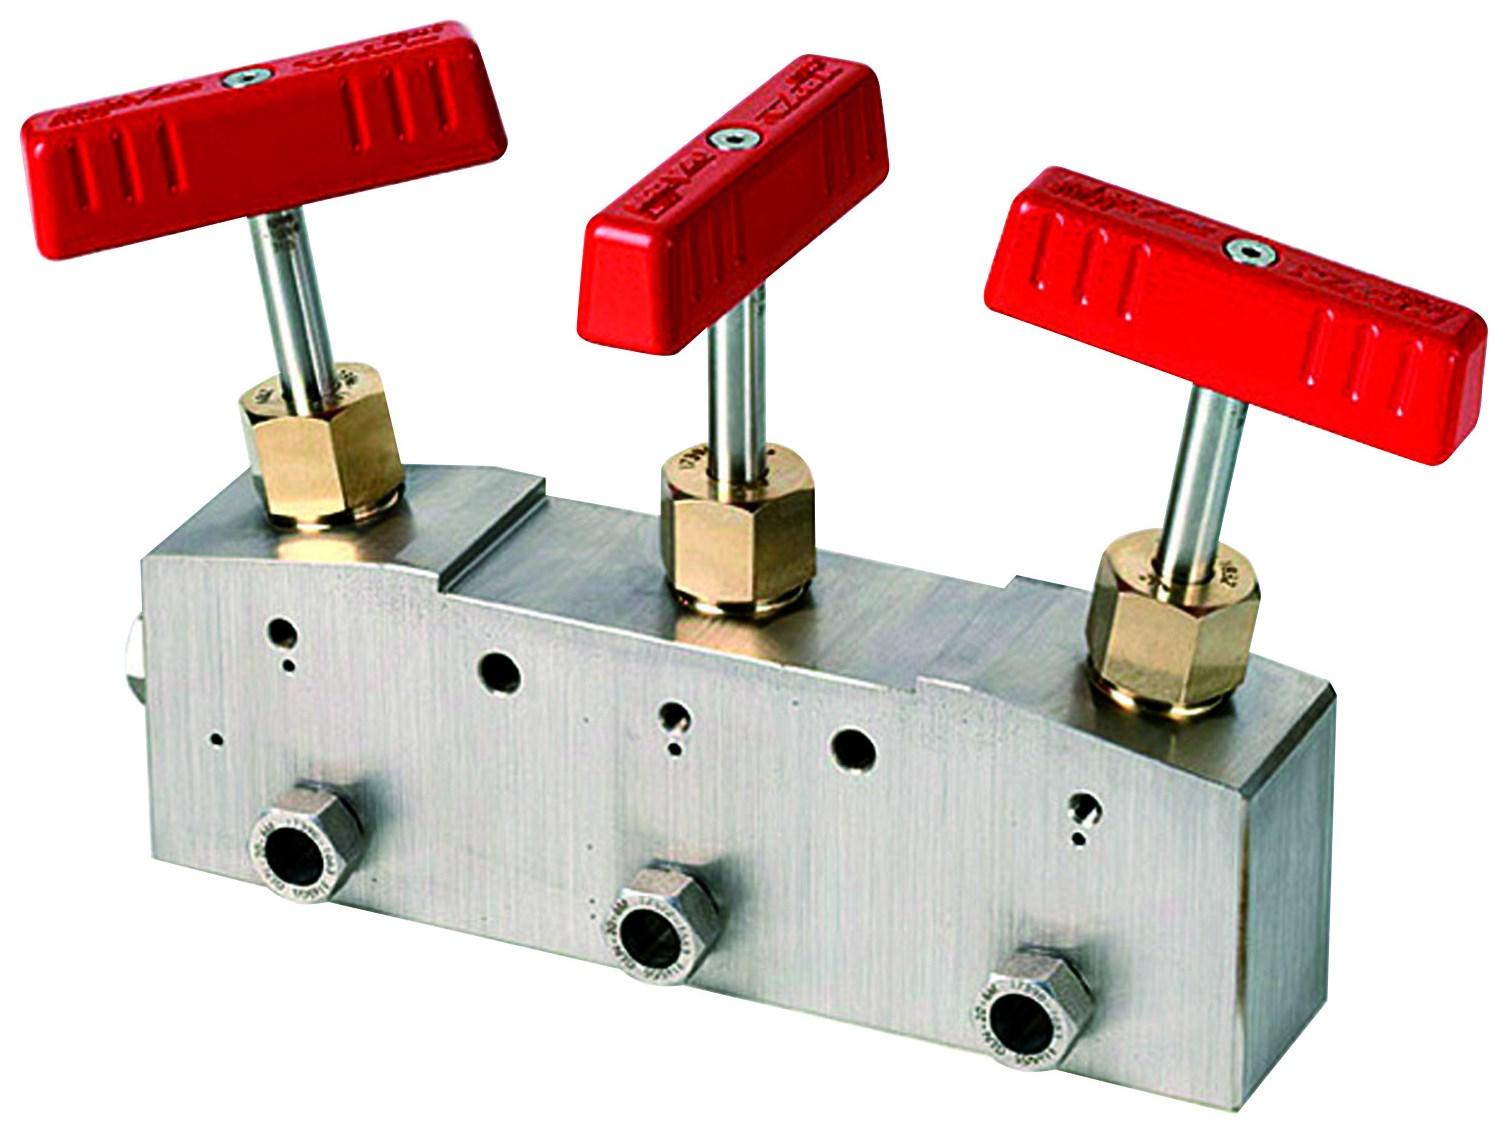 Nåleventiler needle valve høytrykk high pressure DBB Block Bleed kobling Nova Swiss instrument ventiler high pressure systems fitting adapter connector